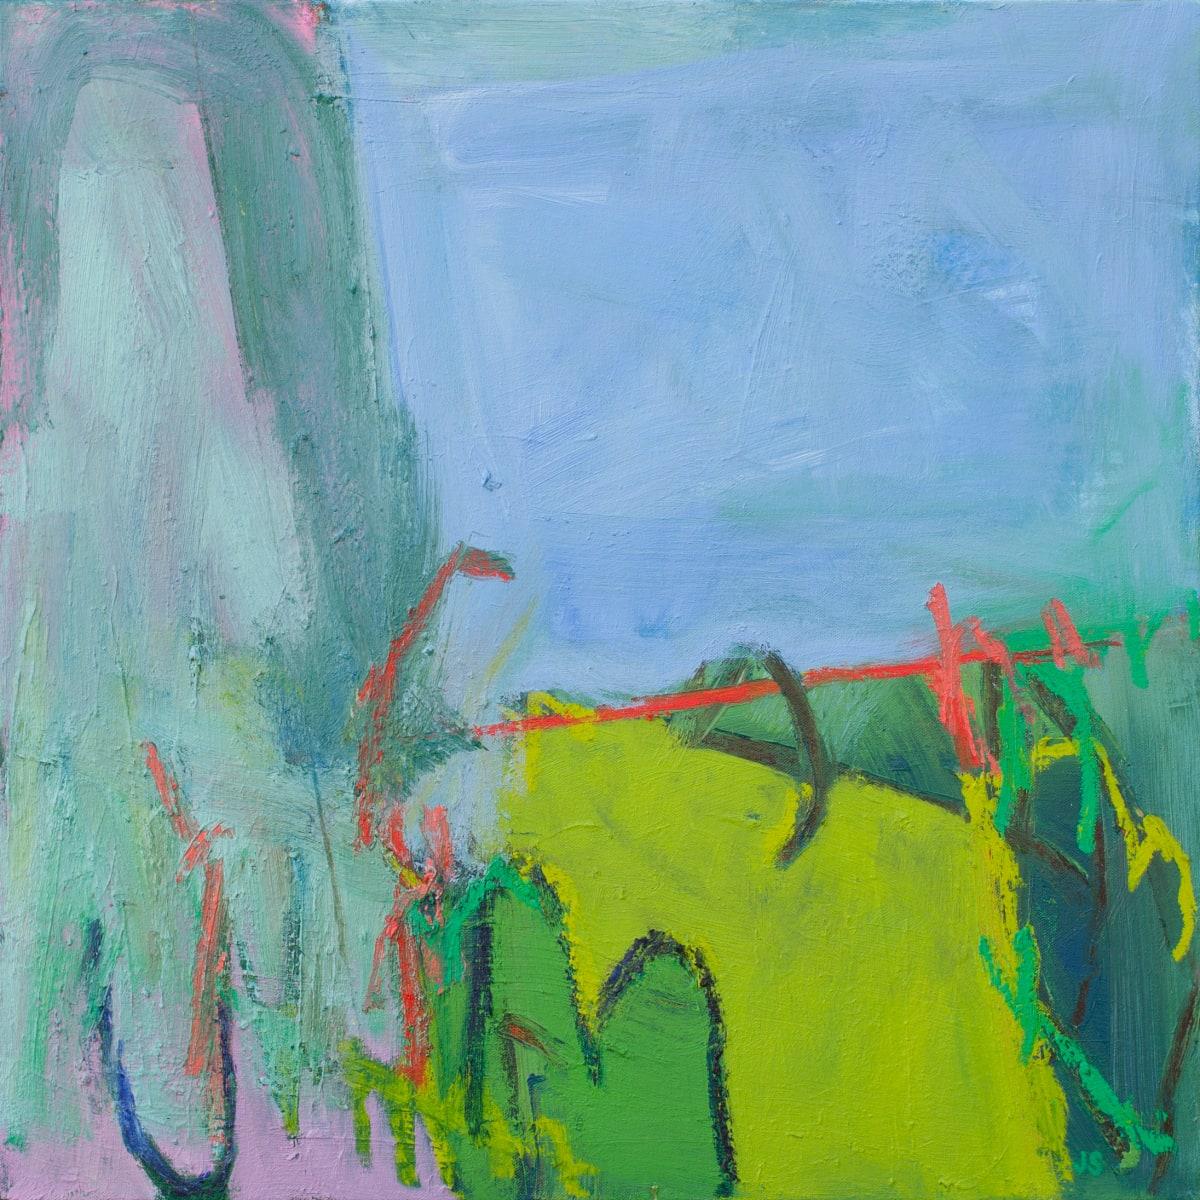 Morning Light by Jessica Singerman